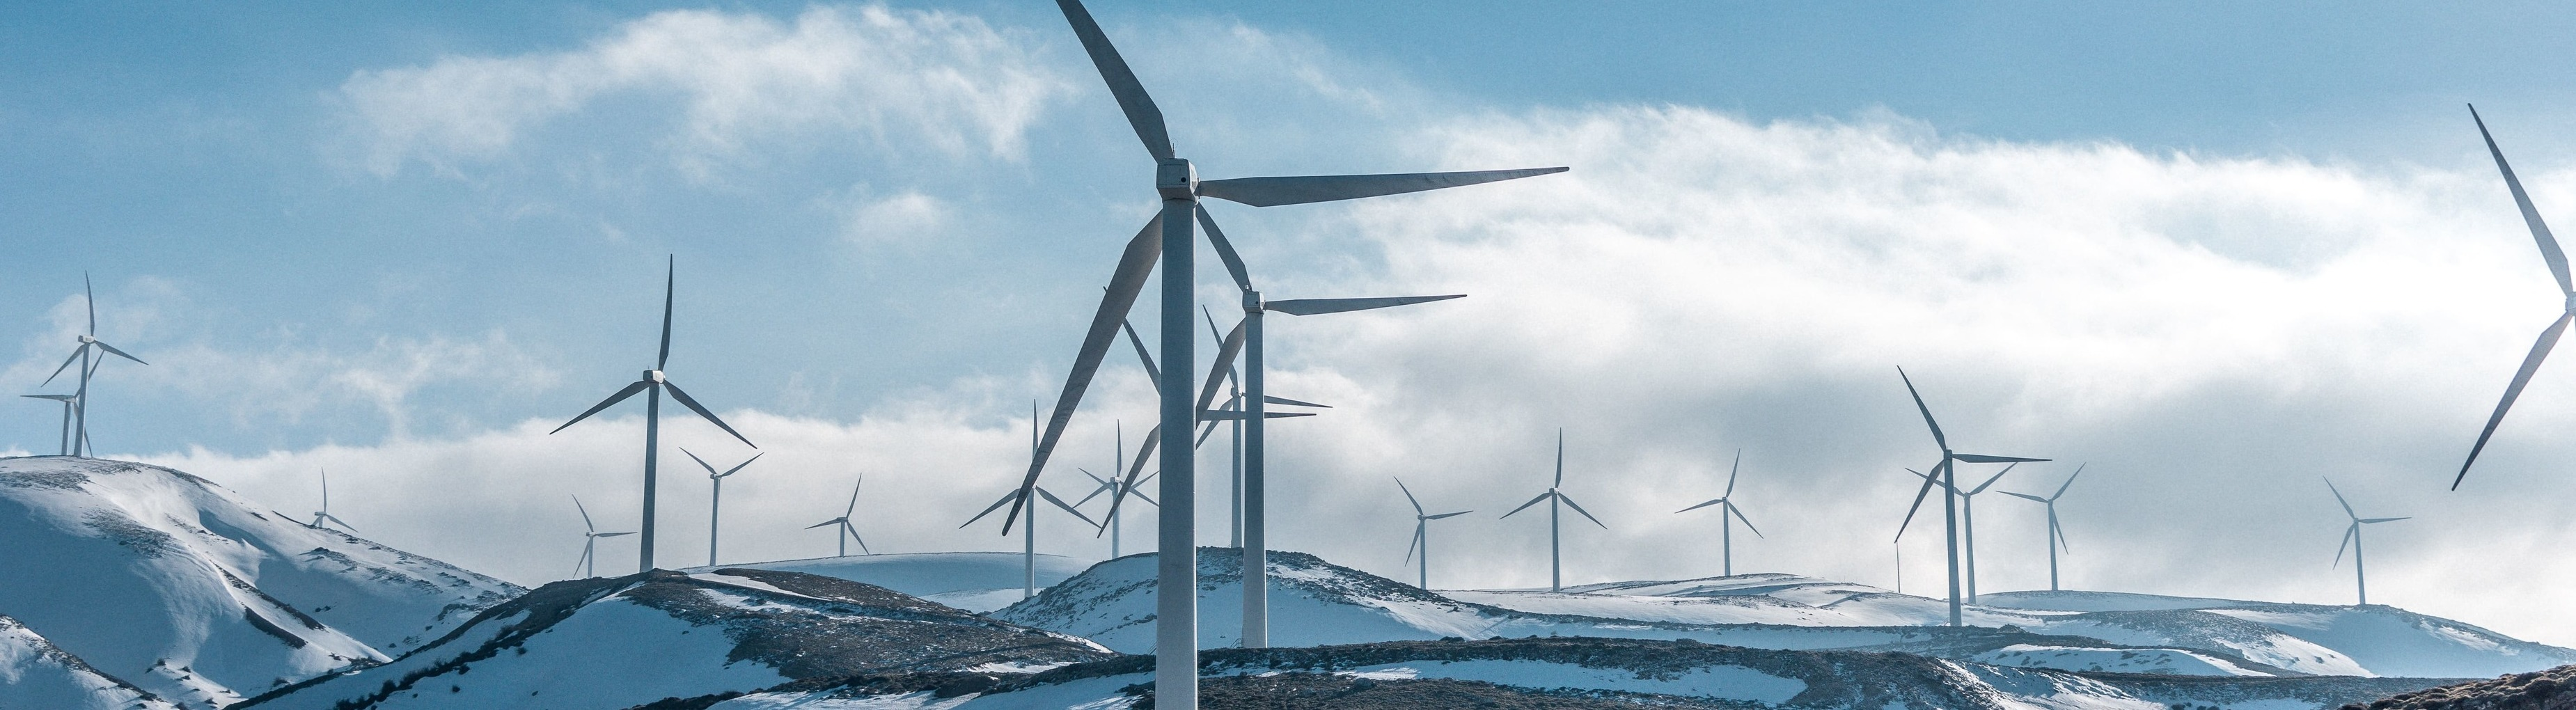 energia-sostenibilidad-catalogo